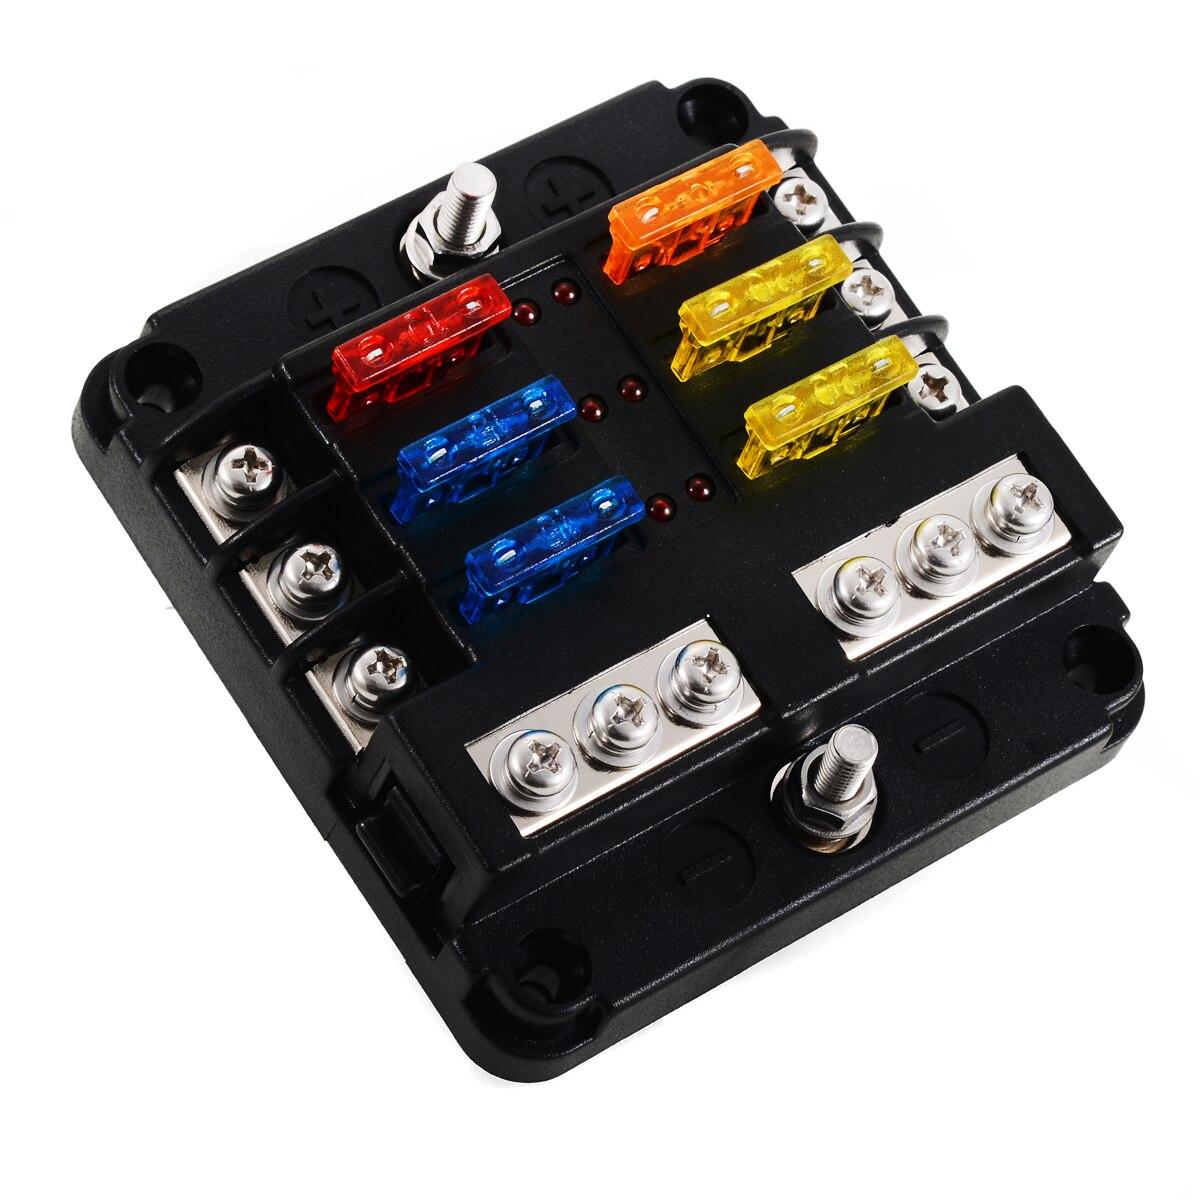 rv fuse box covers 12v 24v plastic cover fuse box holder 6 way blade fuse block case  12v 24v plastic cover fuse box holder 6